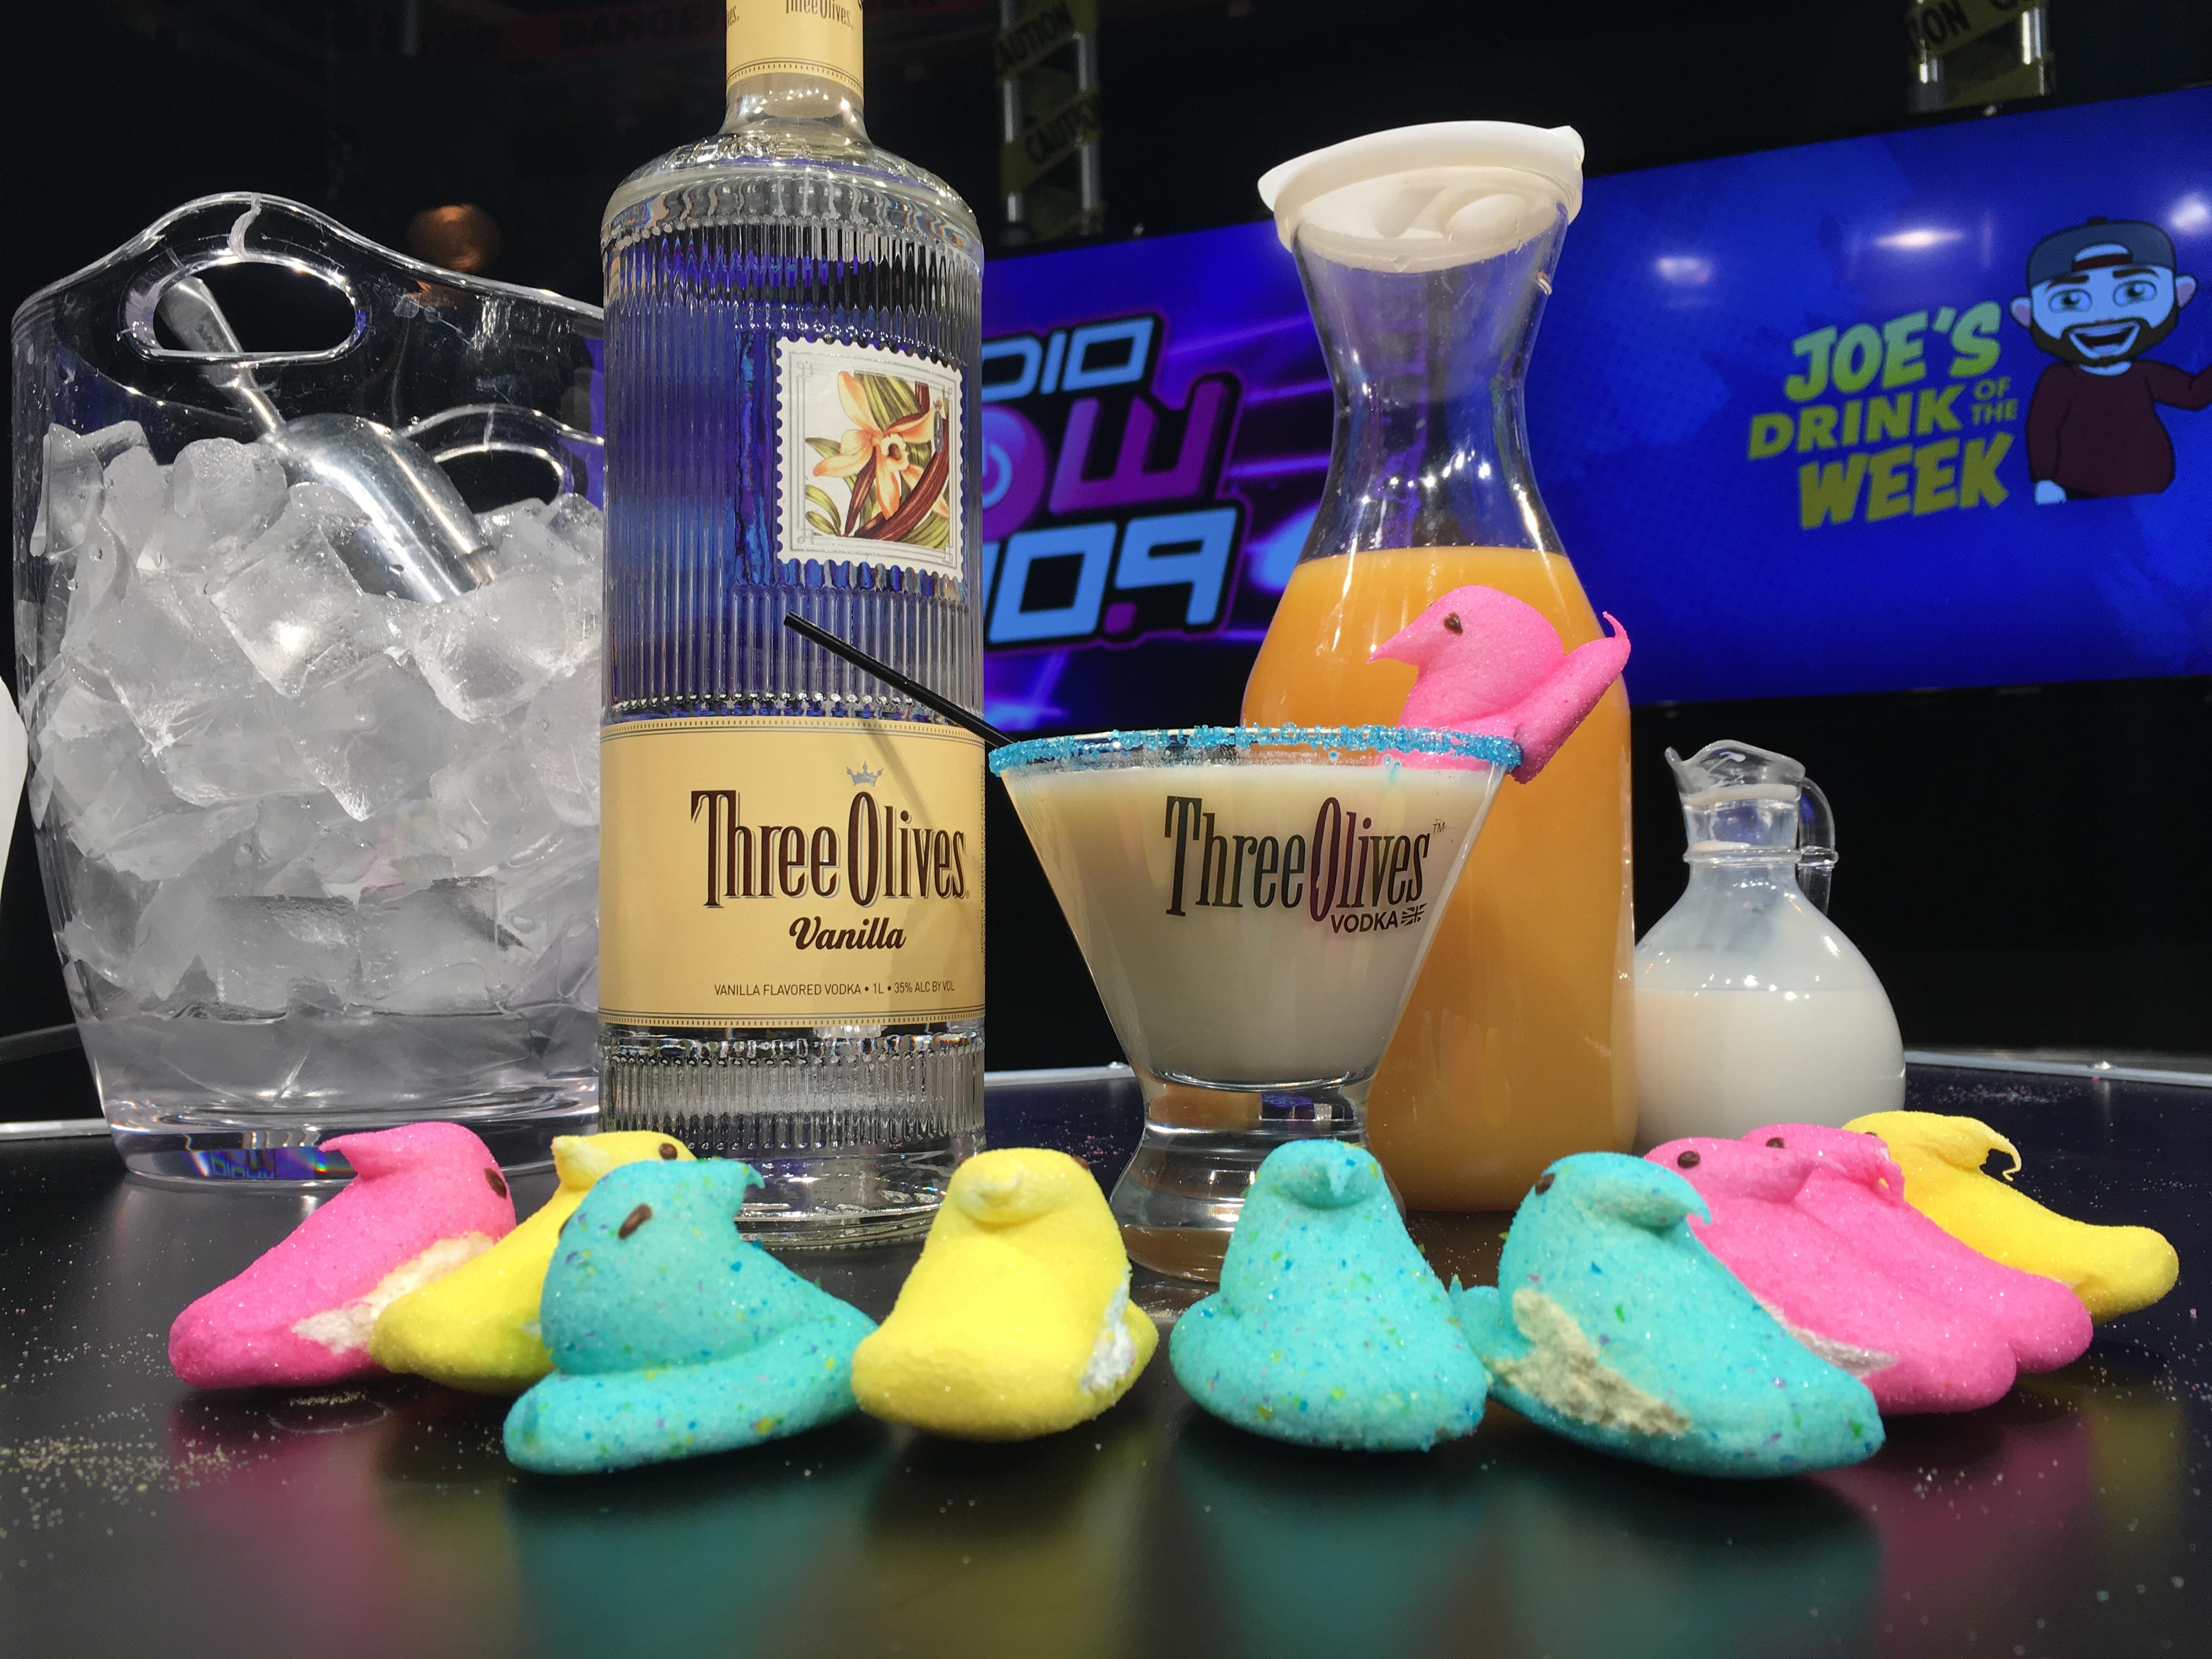 Joe's Drink of the Week: The Peeptini